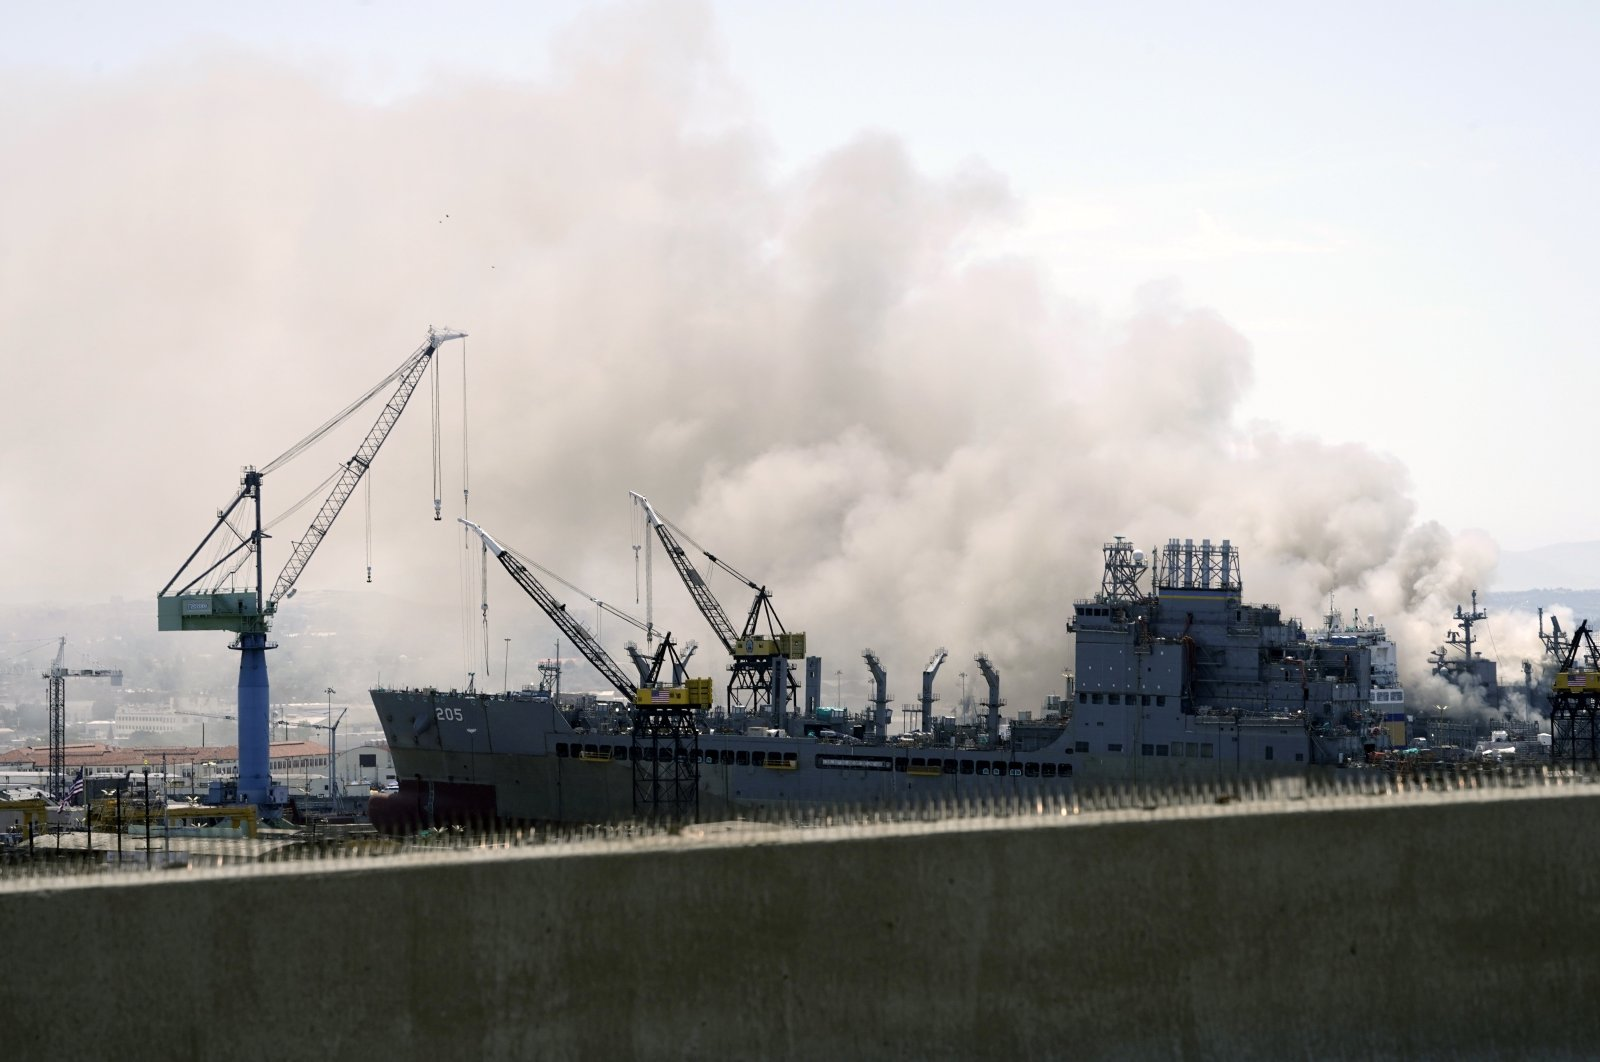 Smoke rises from a fire on board the U.S. Navy amphibious assault ship USS Bonhomme Richard at Naval Base San Diego, California, U.S., July 12, 2020. (Reuters Photo)